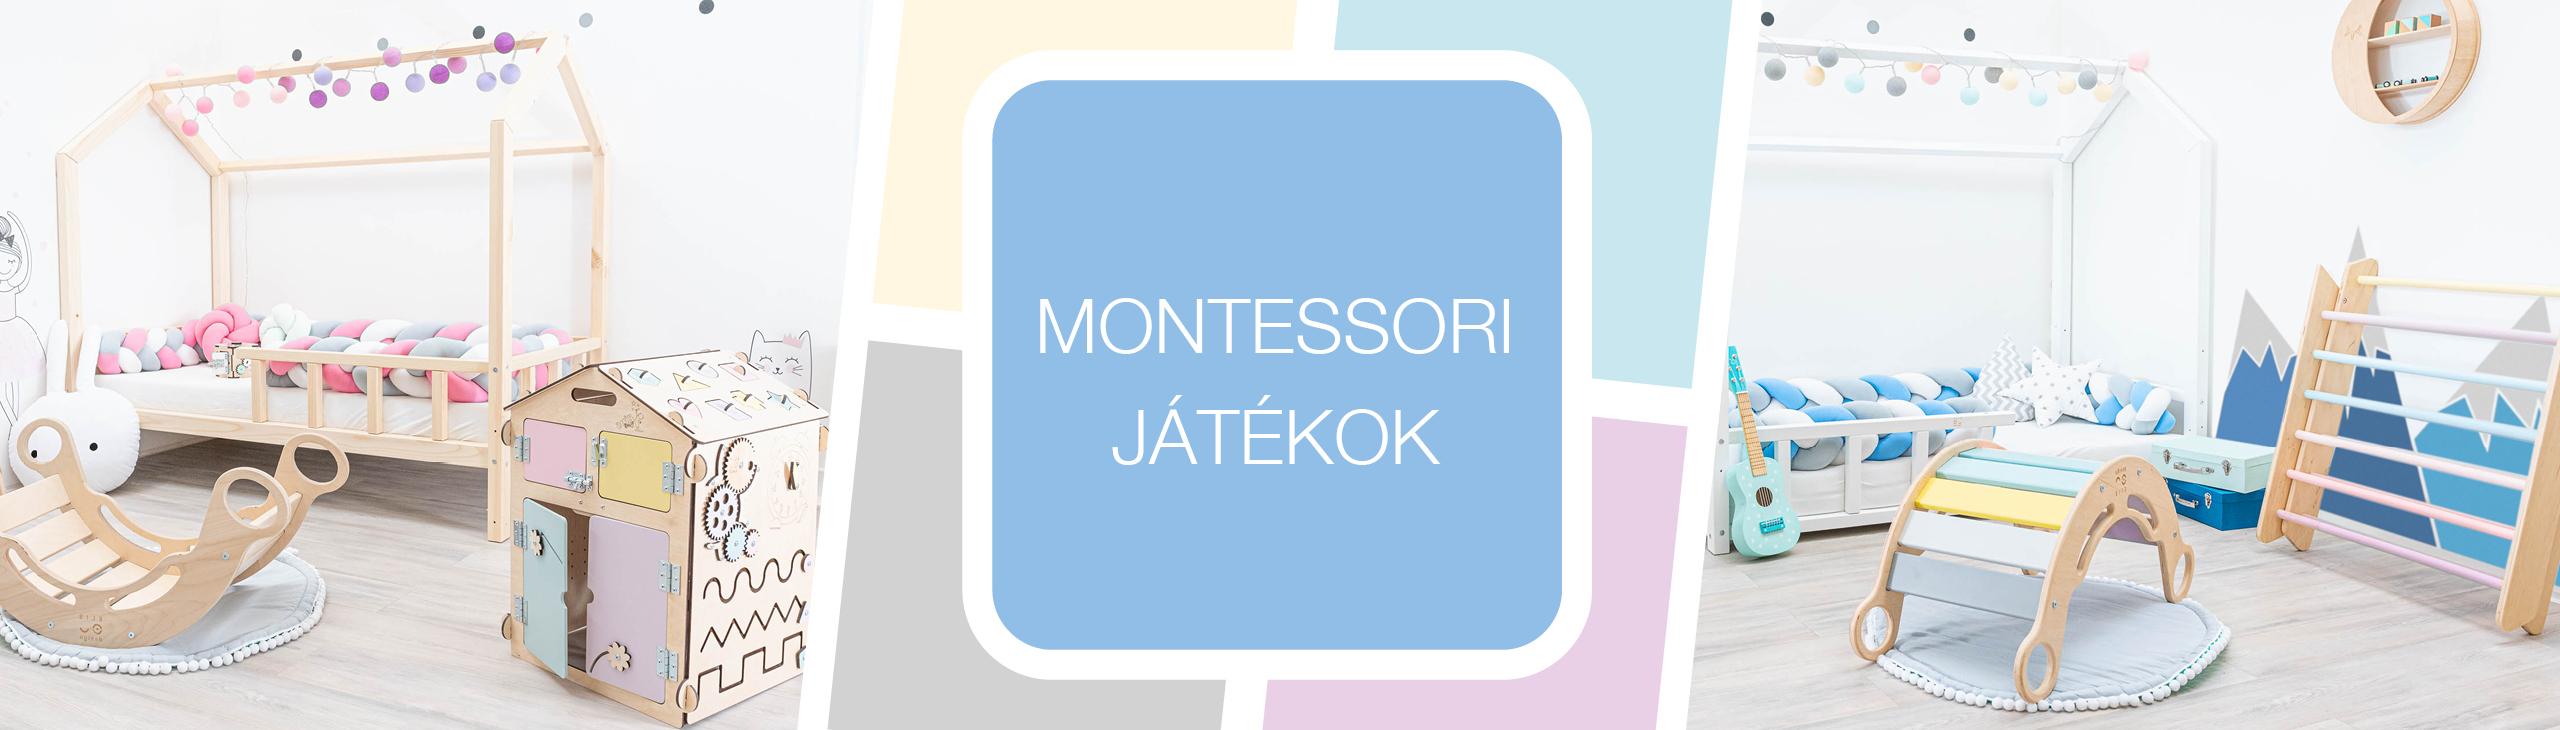 Montesssori játékok